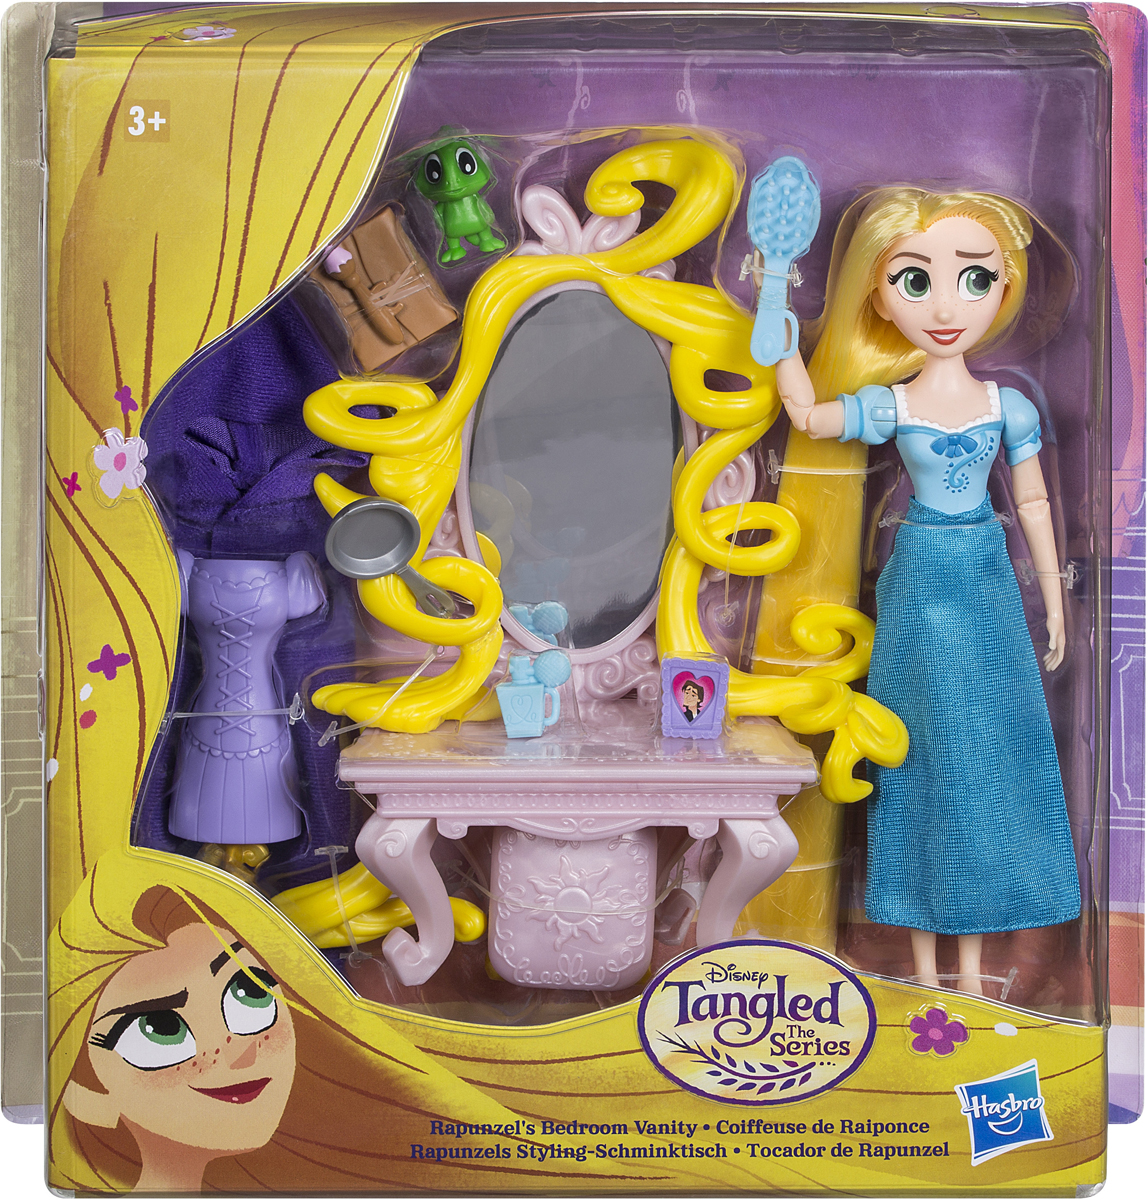 Disney Tangled Кукла Рапунцель с аксессуарами - Куклы и аксессуары